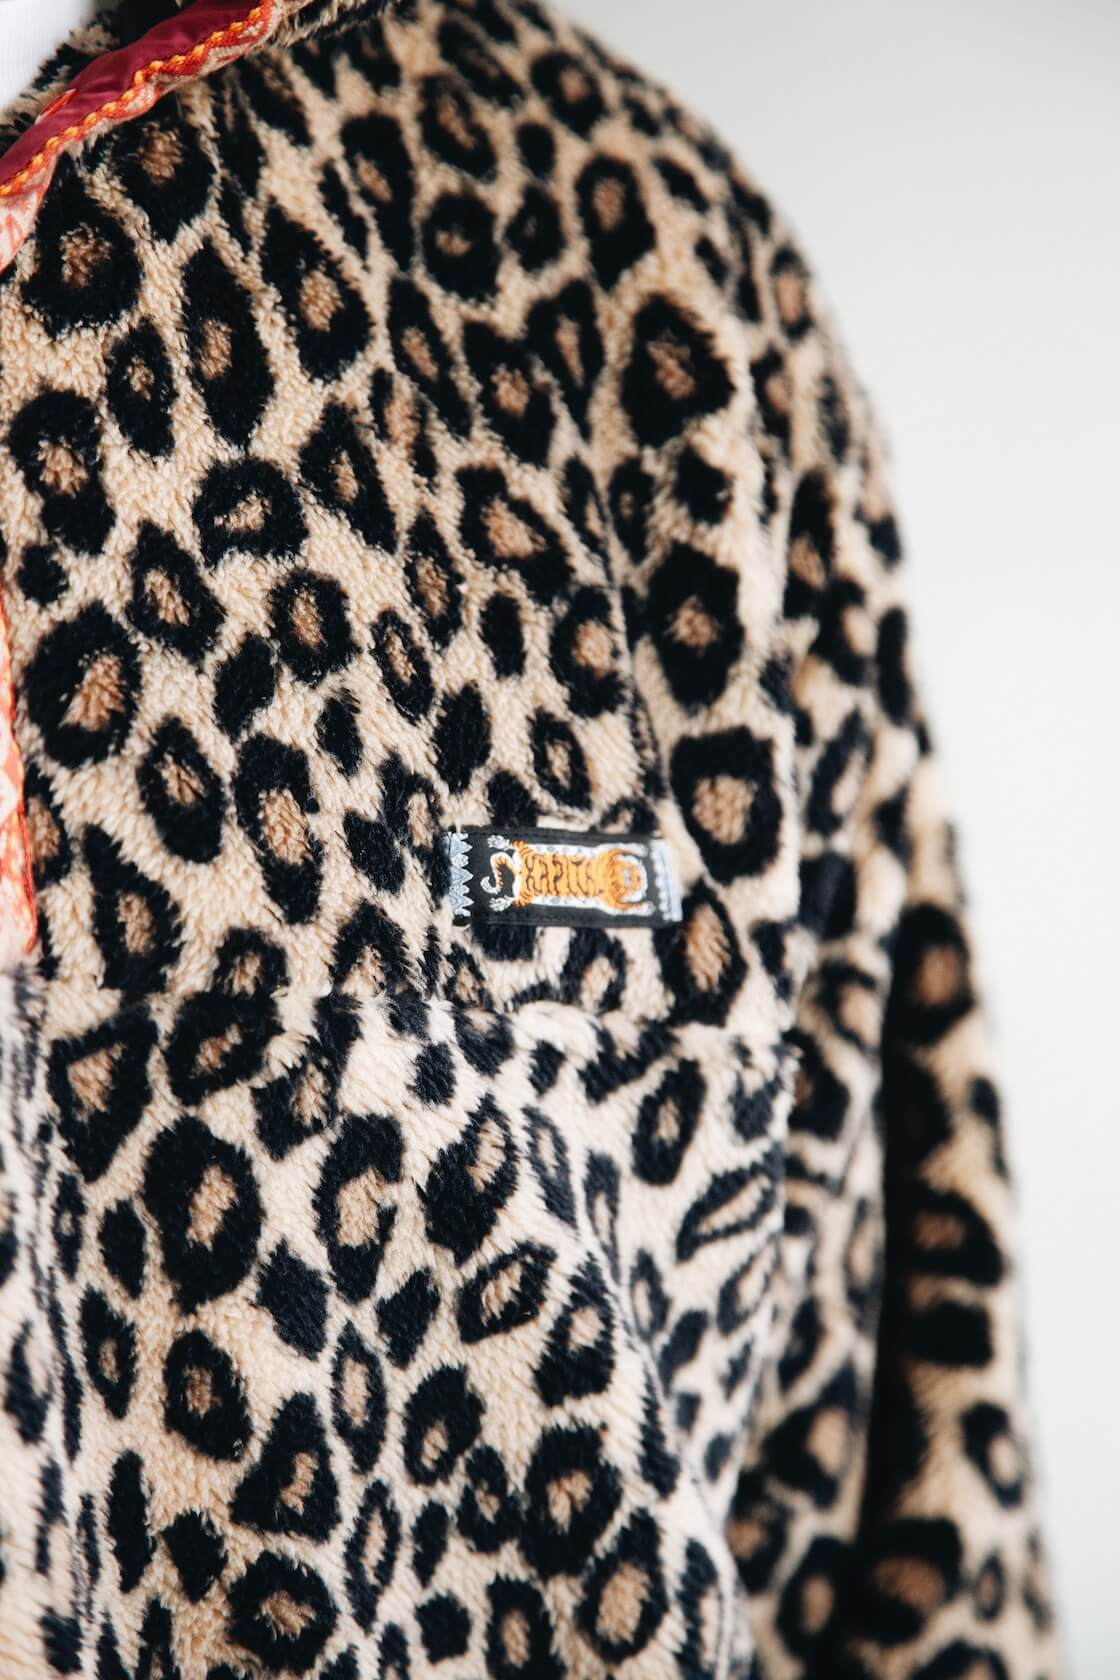 kapital kountry leopard fleece snap pullover on body